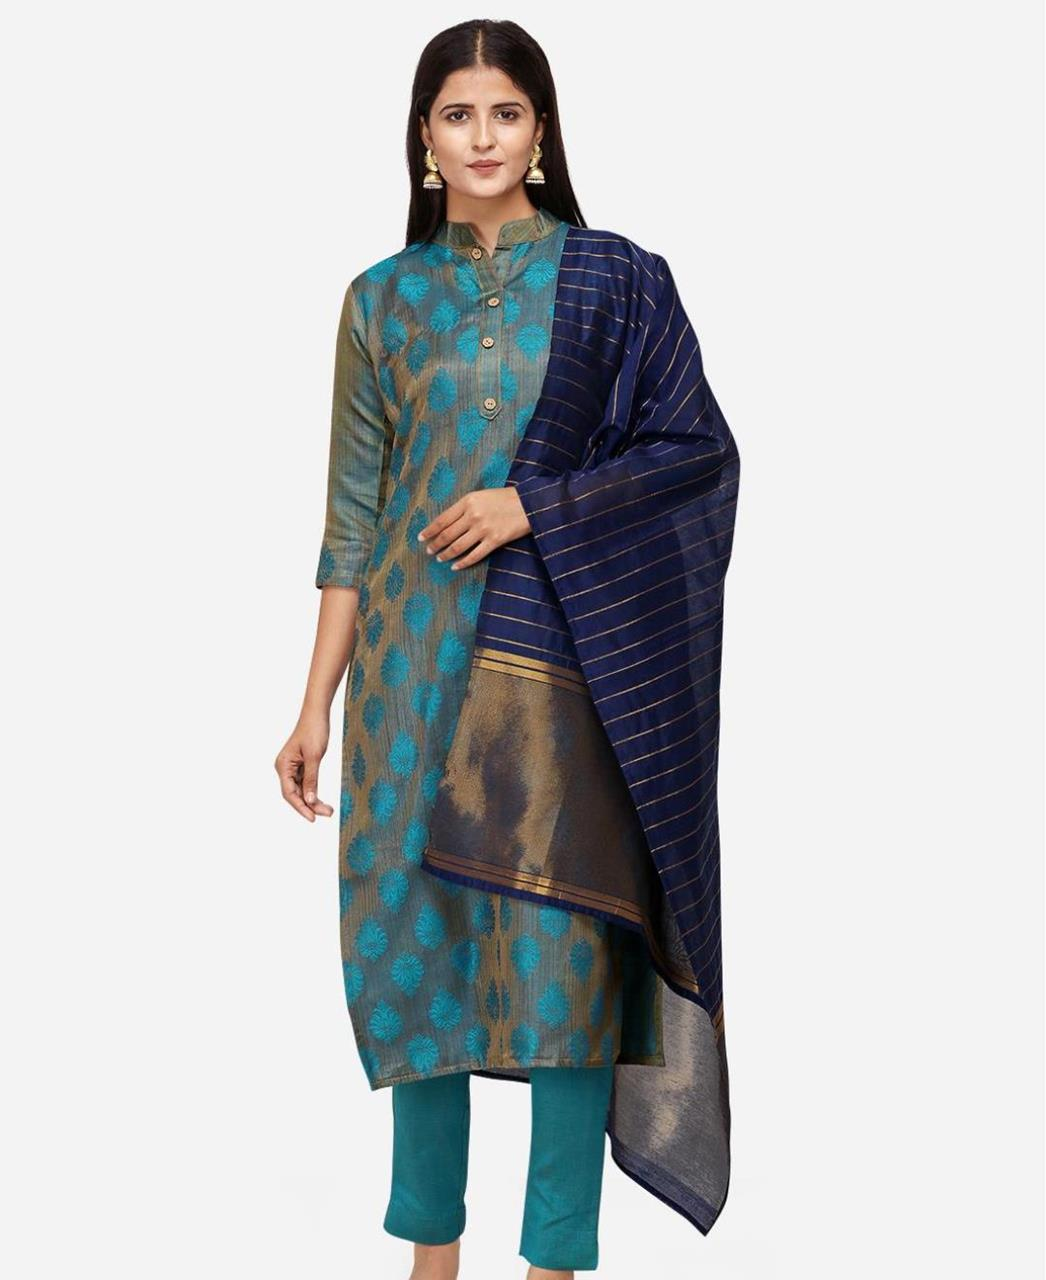 Cotton Straight cut Salwar Kameez in Teal Blue